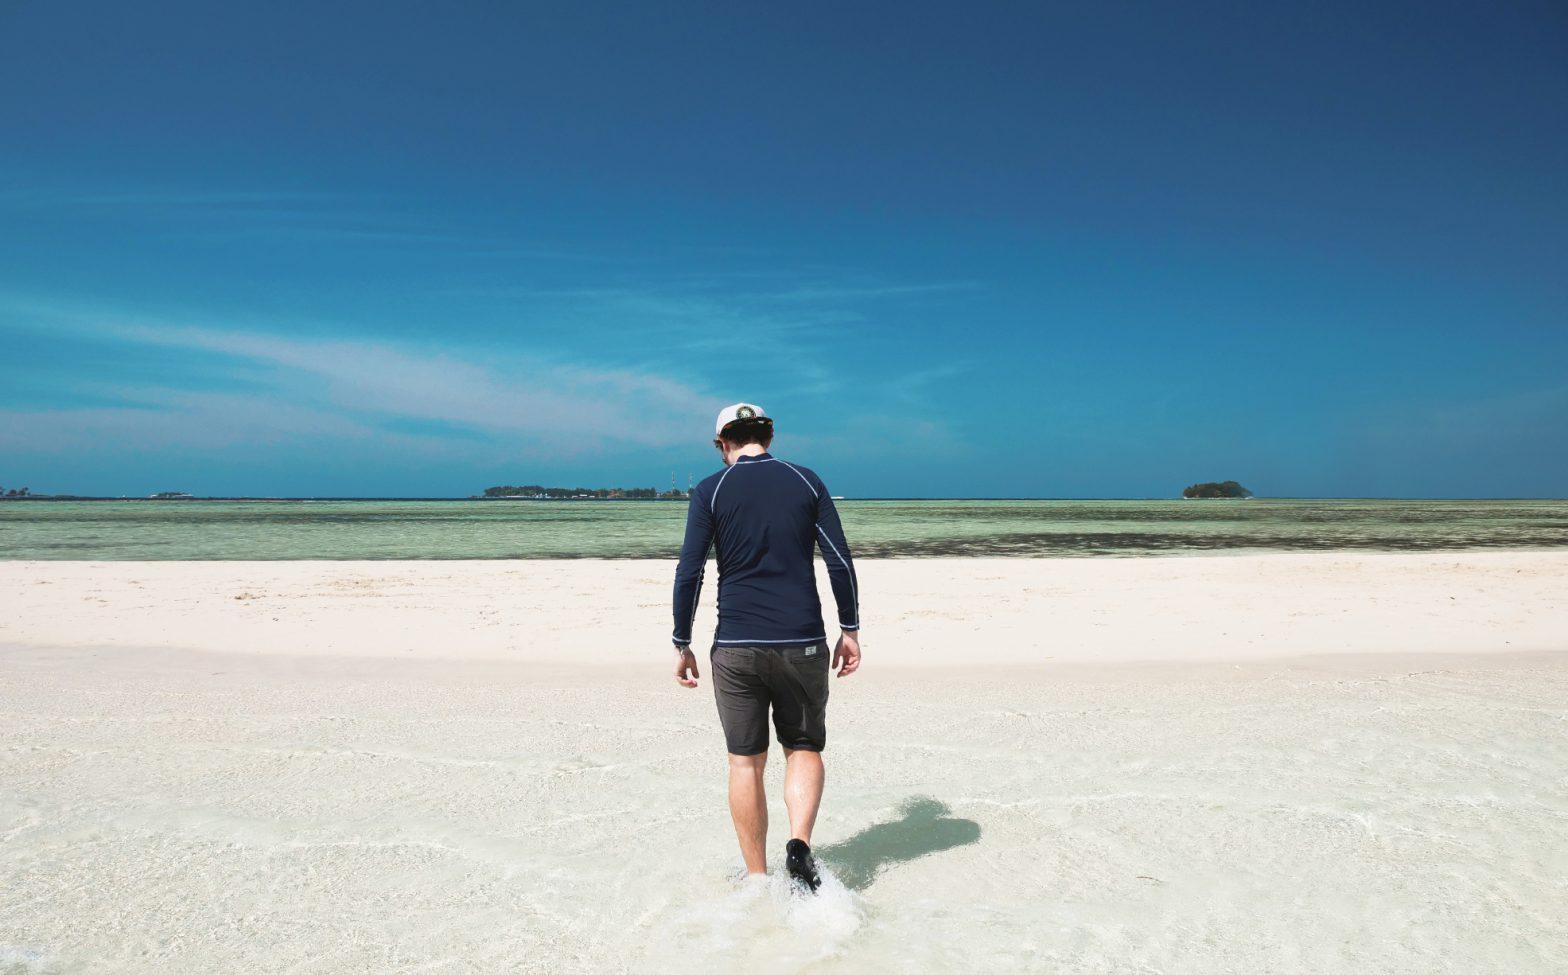 Philip am Sandstrand